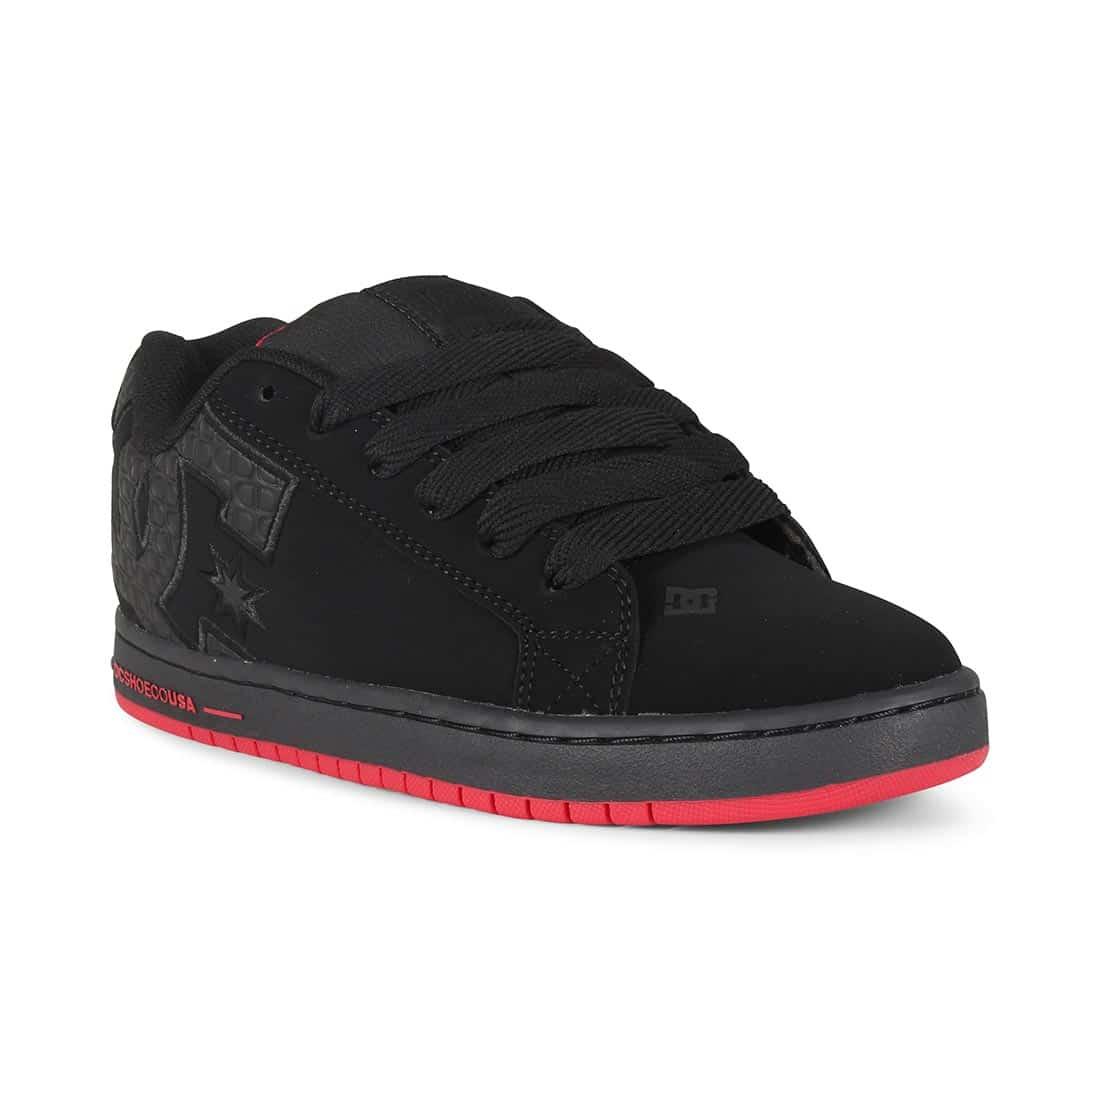 DC Shoes Court Graffik SE - Black / Red / Black